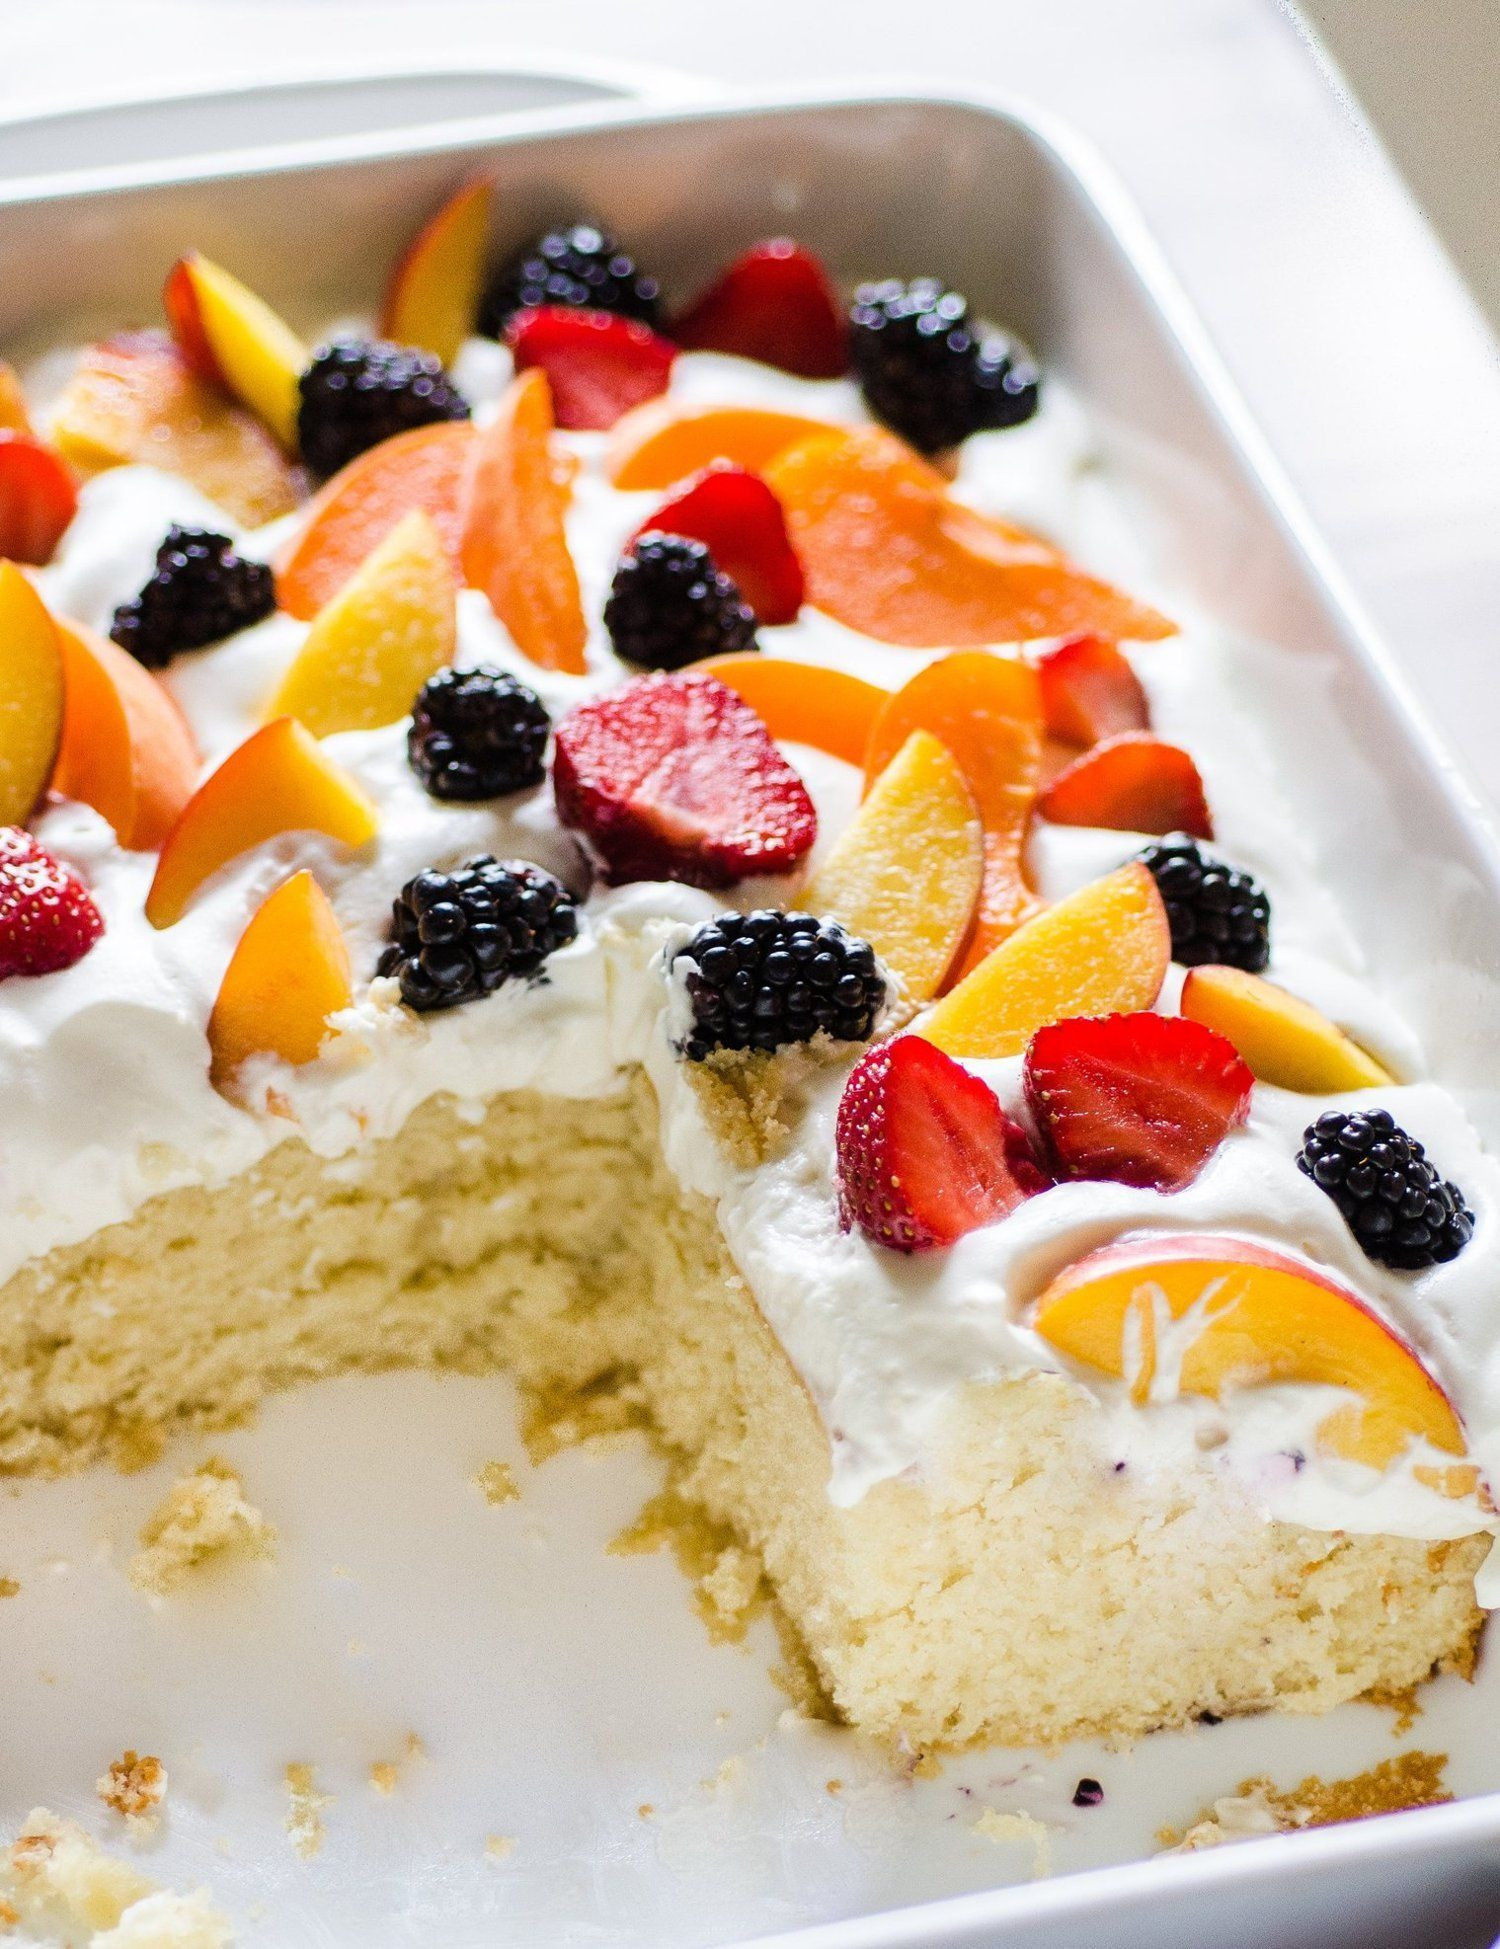 Summer Fruit Desserts Recipes  Easy Summer Cake with Fruit & Cream Recipe